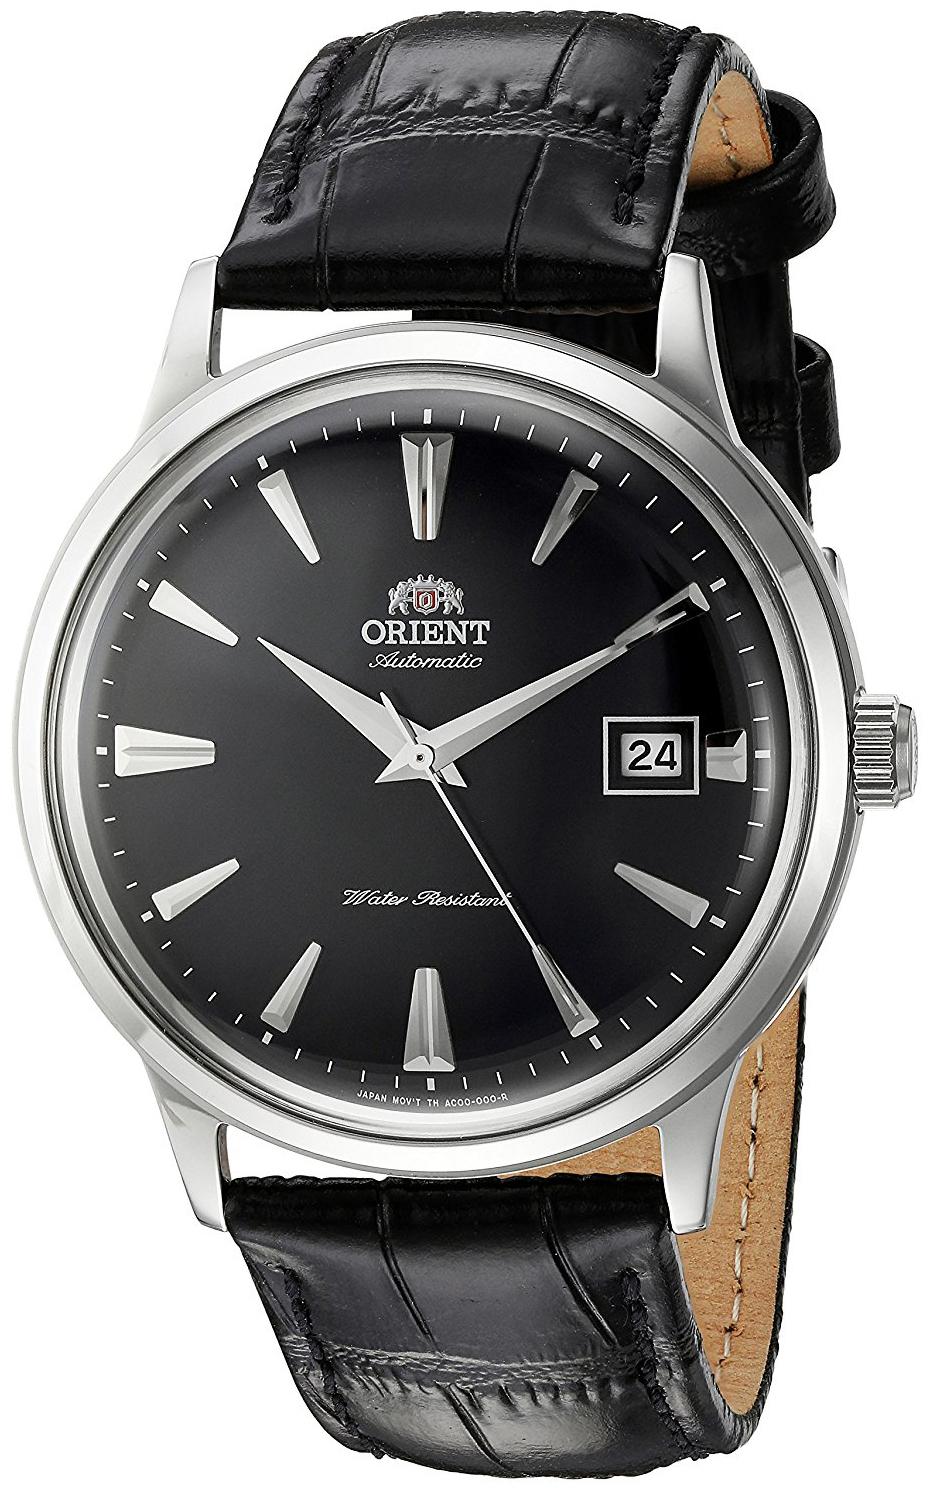 Orient Classic Herreklokke FAC00004B0 Sort/Lær Ø41 mm - Orient